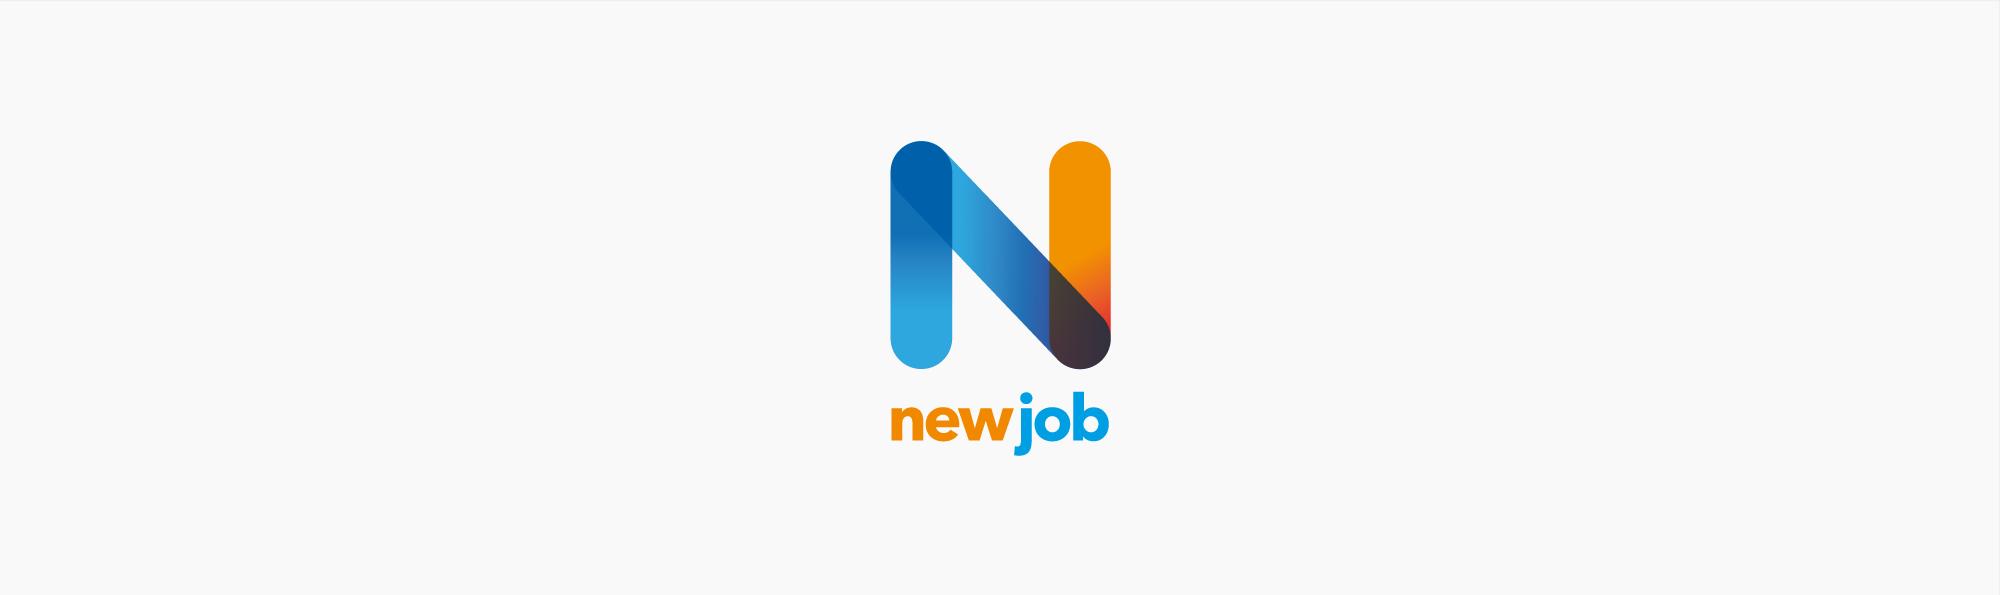 NewJob-branding-01